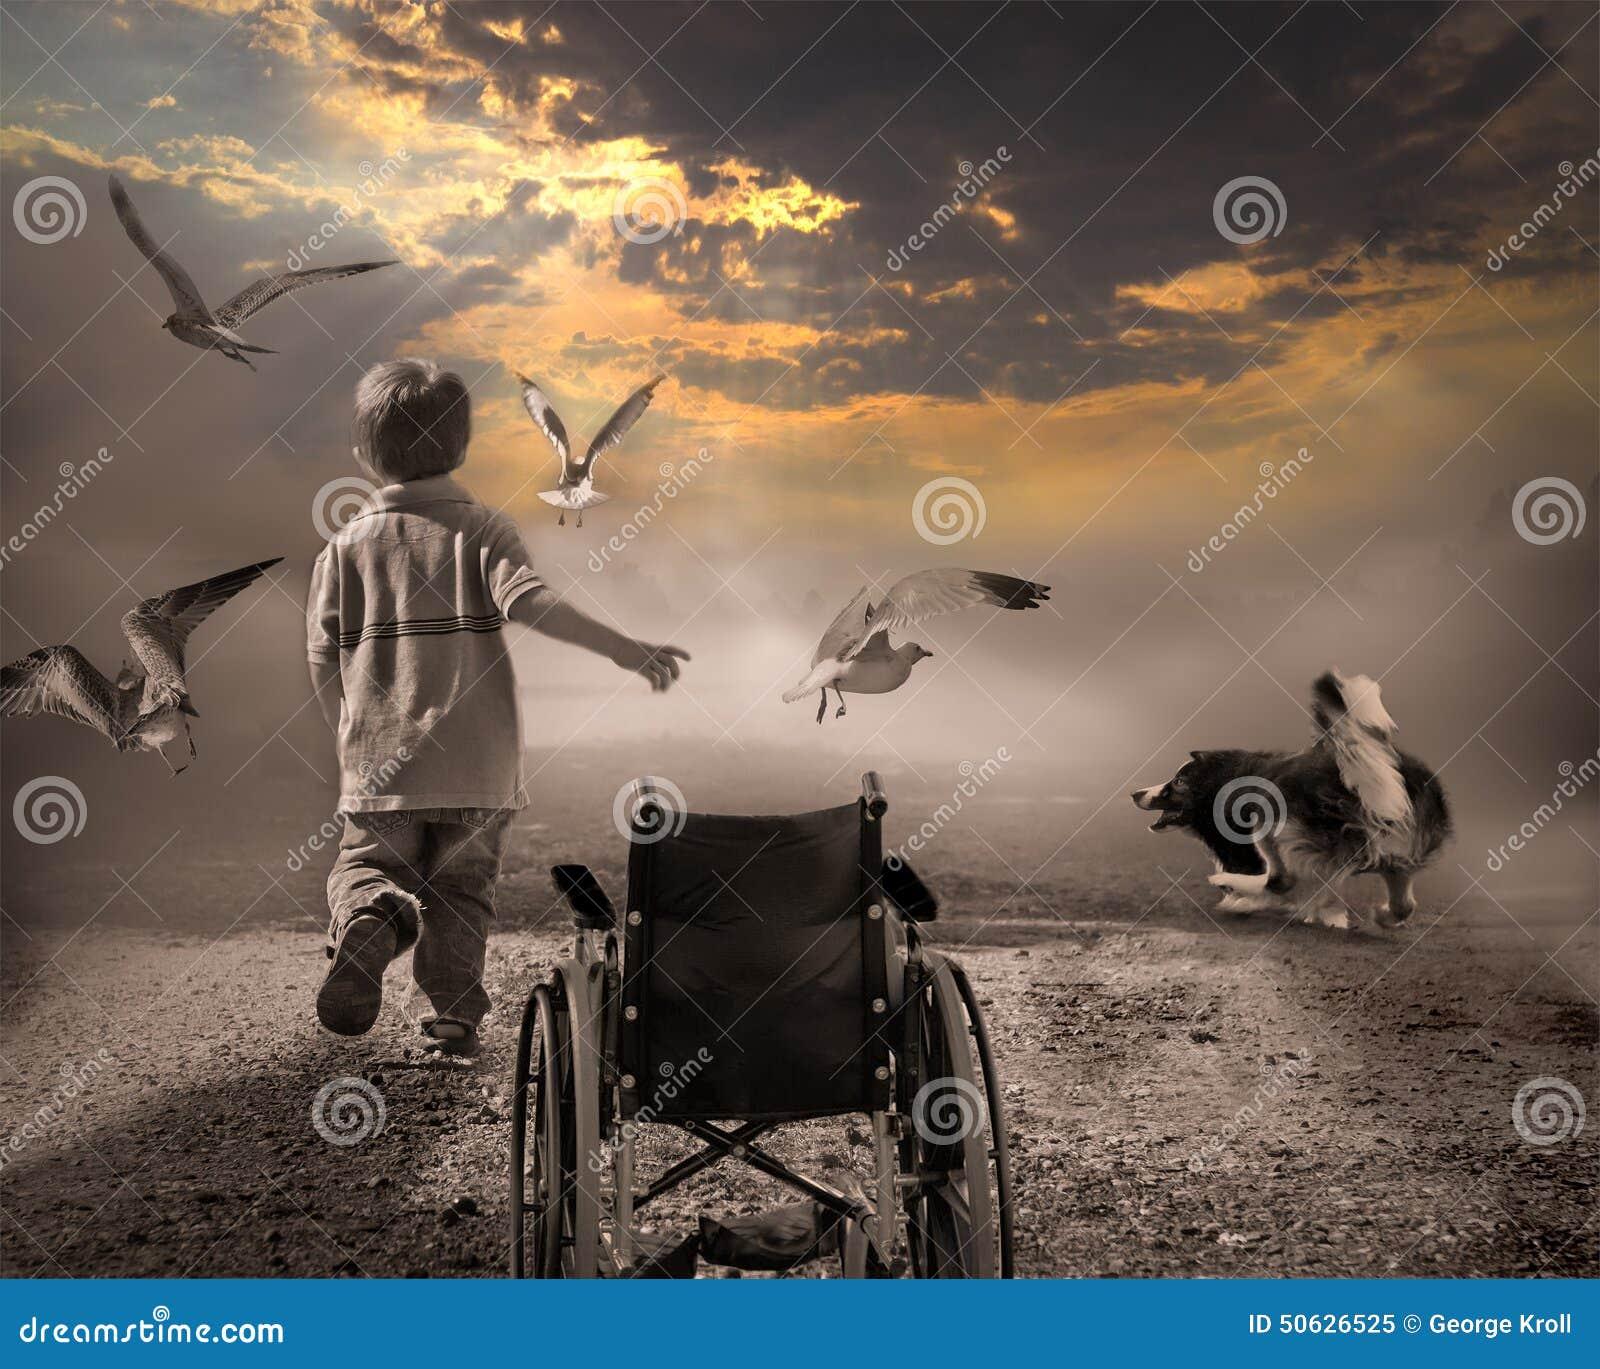 Hope,wish,dream, struggle, free!